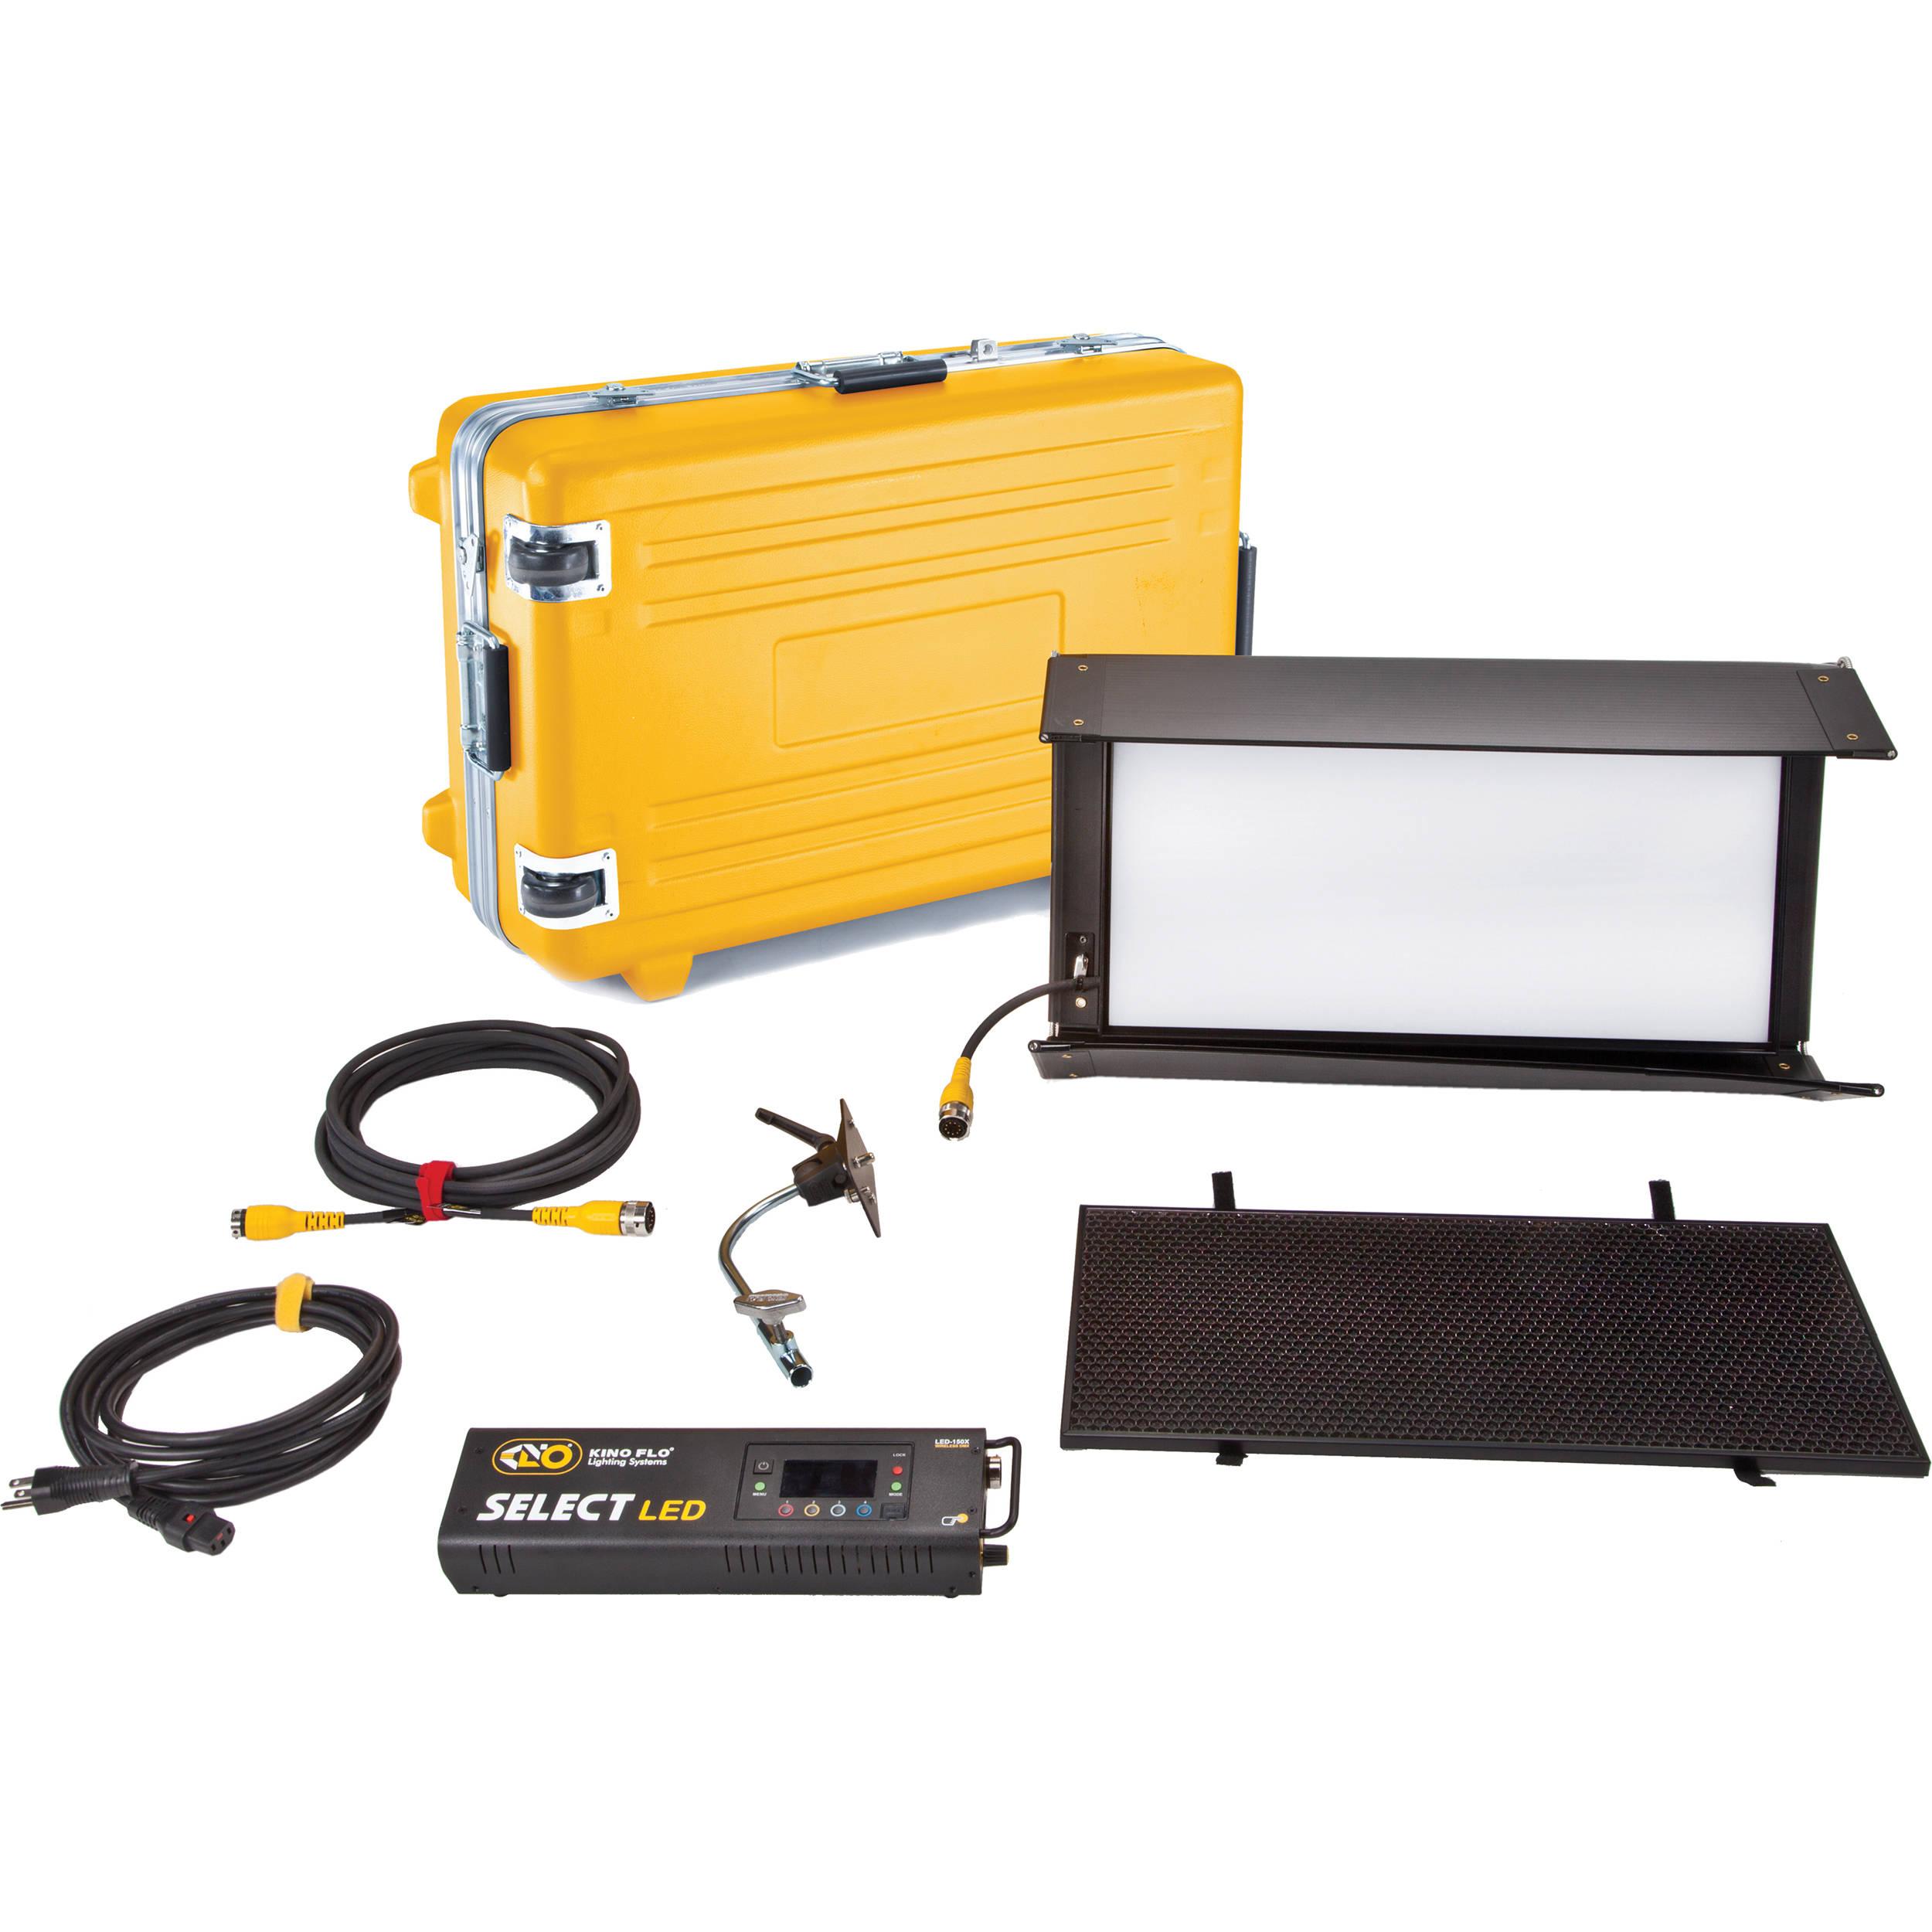 Kino Flo Select 12 DMX Kit with Flight Case